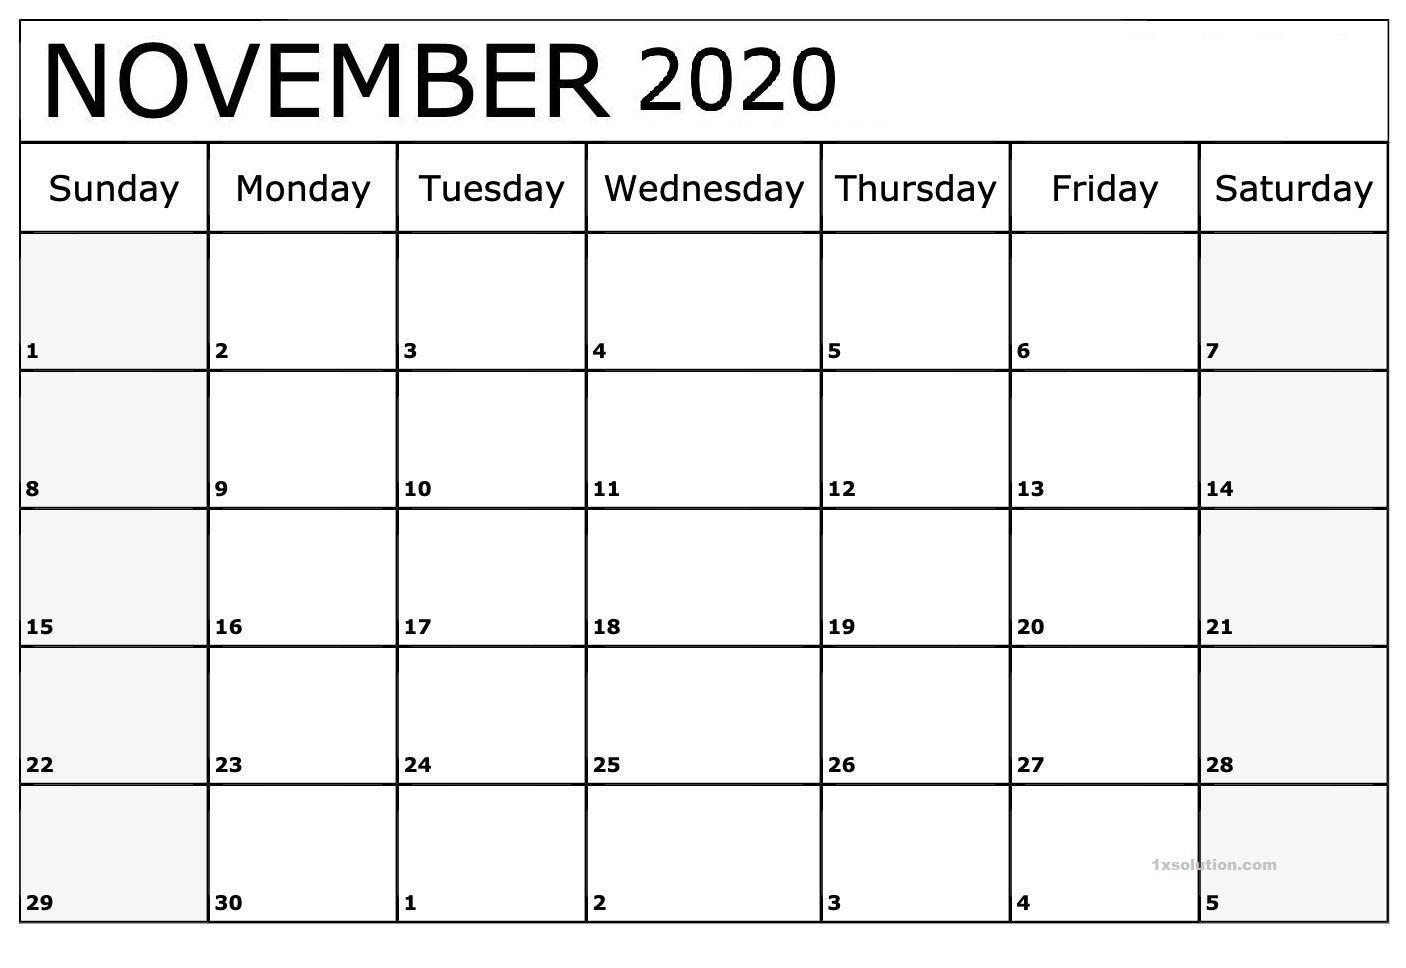 November 2020 Calendar Excel Sheet With Notes